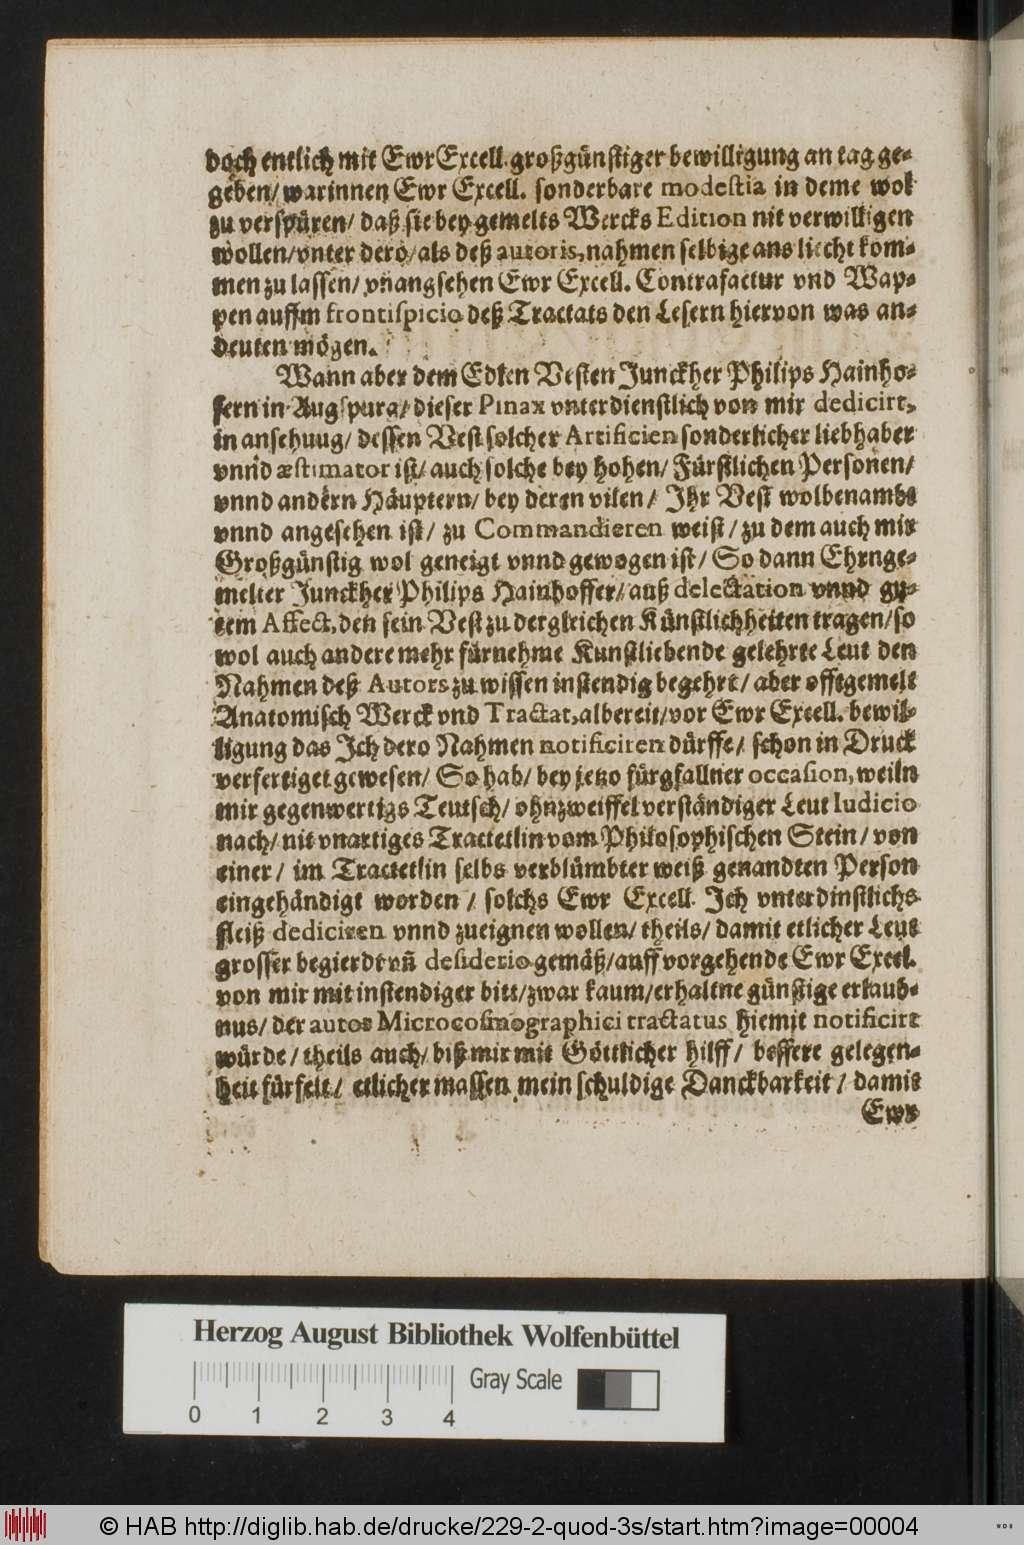 http://diglib.hab.de/drucke/229-2-quod-3s/00004.jpg